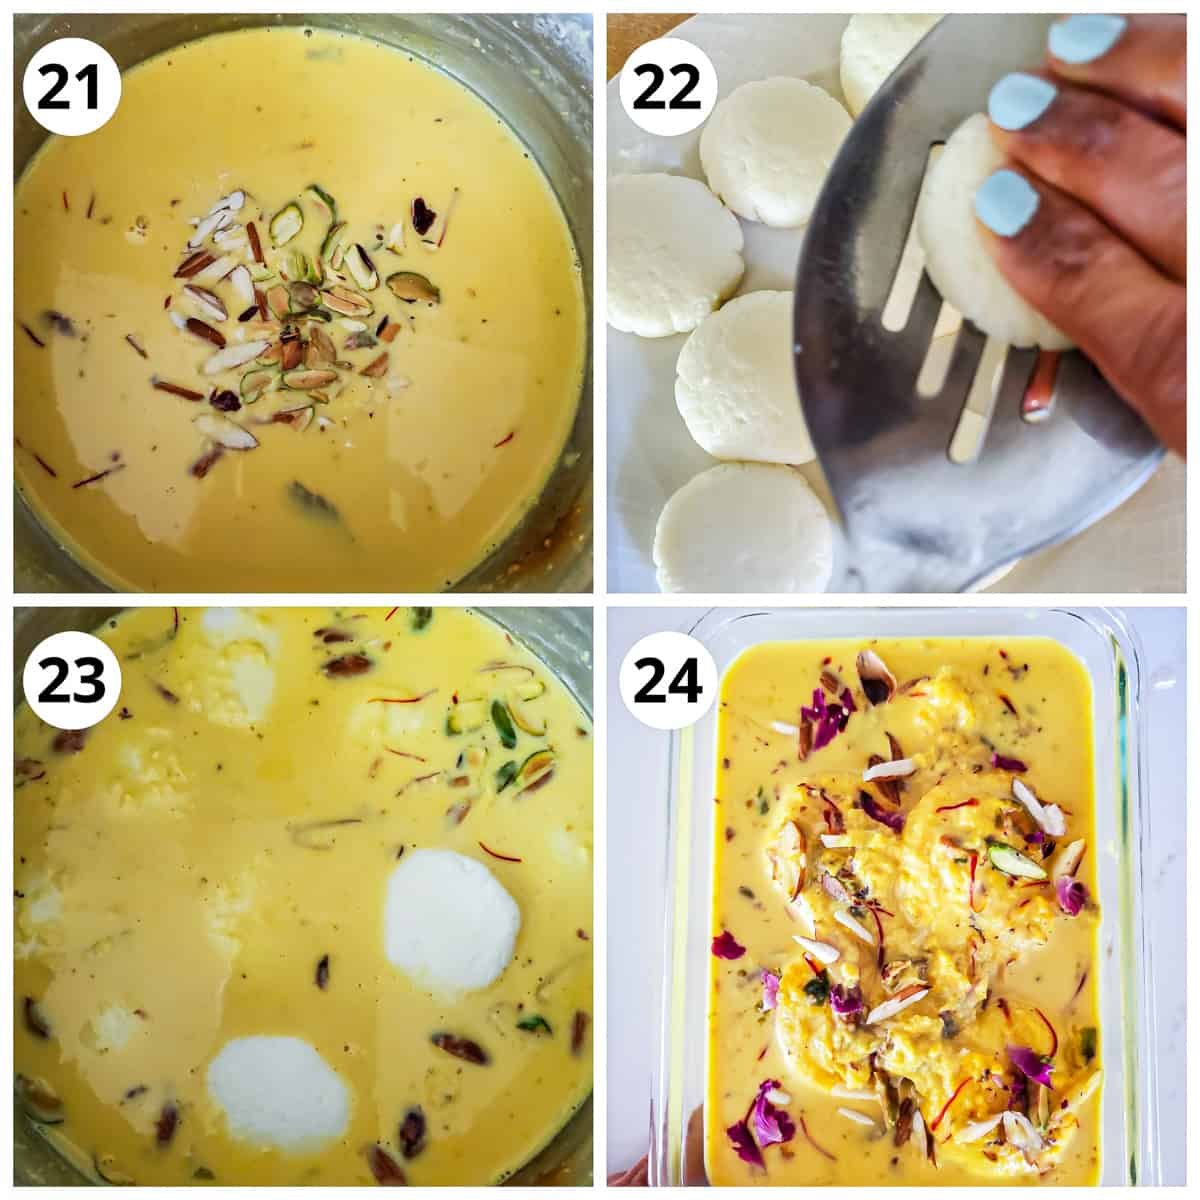 Adding sugar soaked rasmalai to rabri